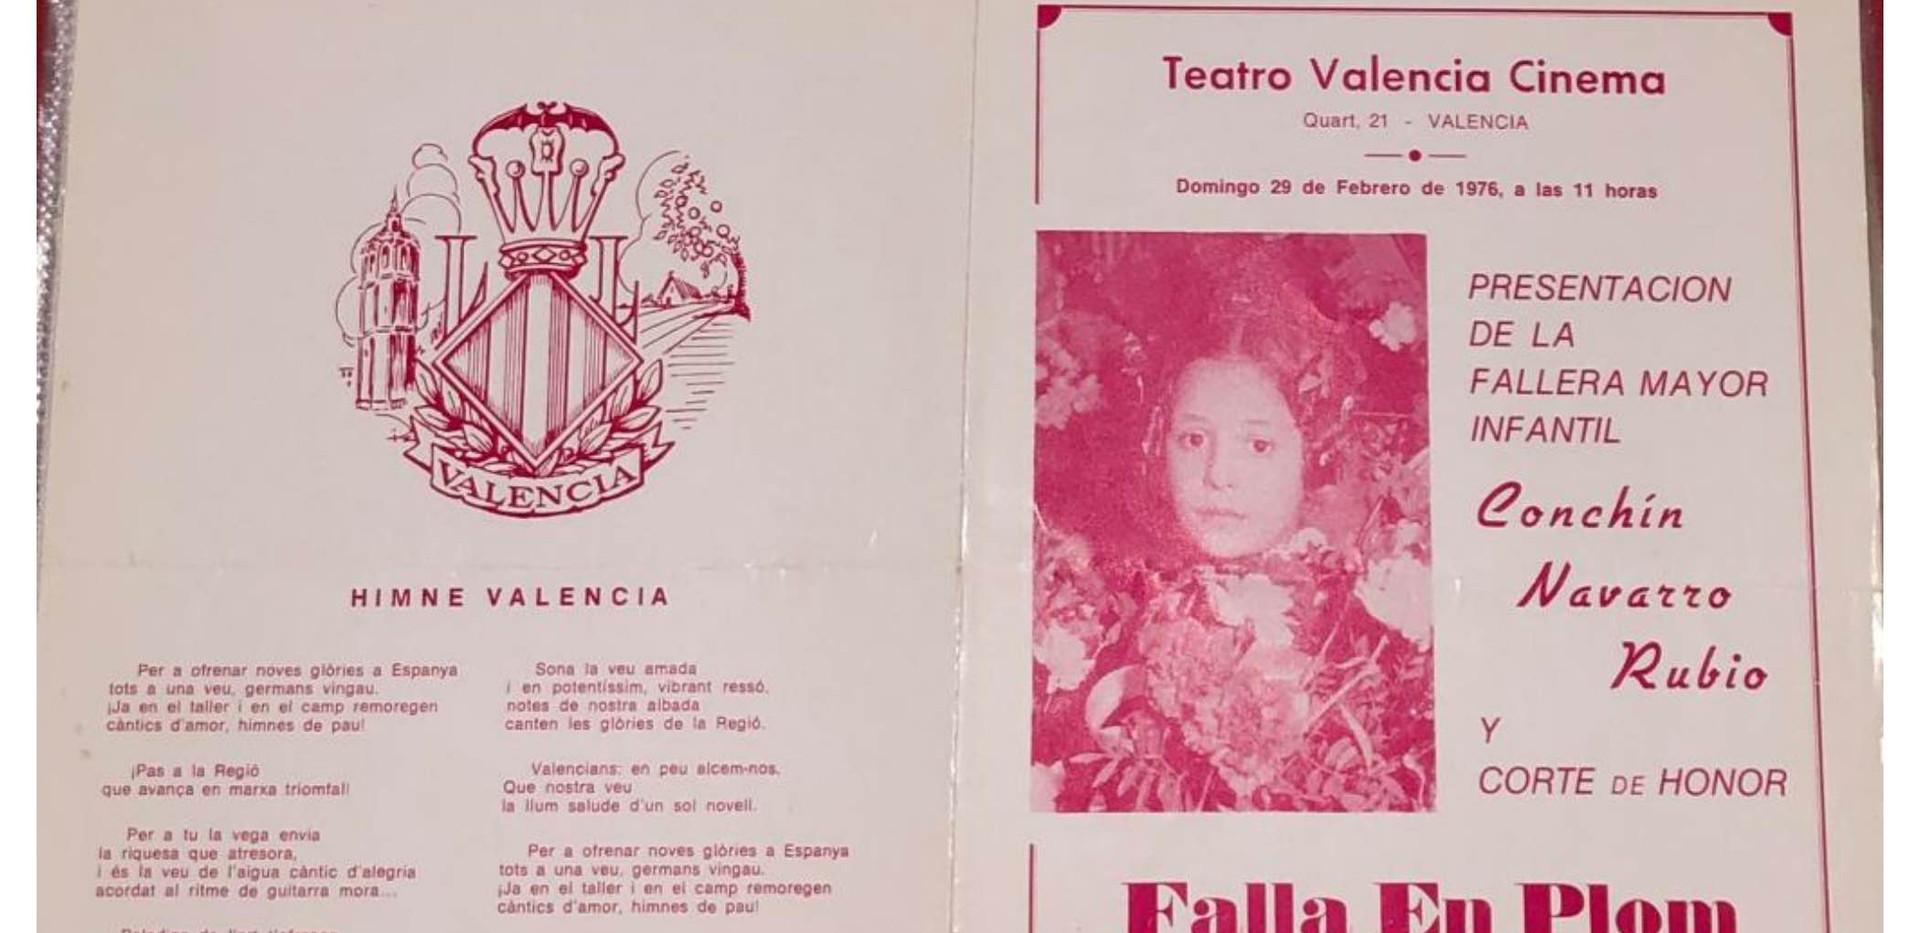 Cartel presentación infantil 1976.jpg